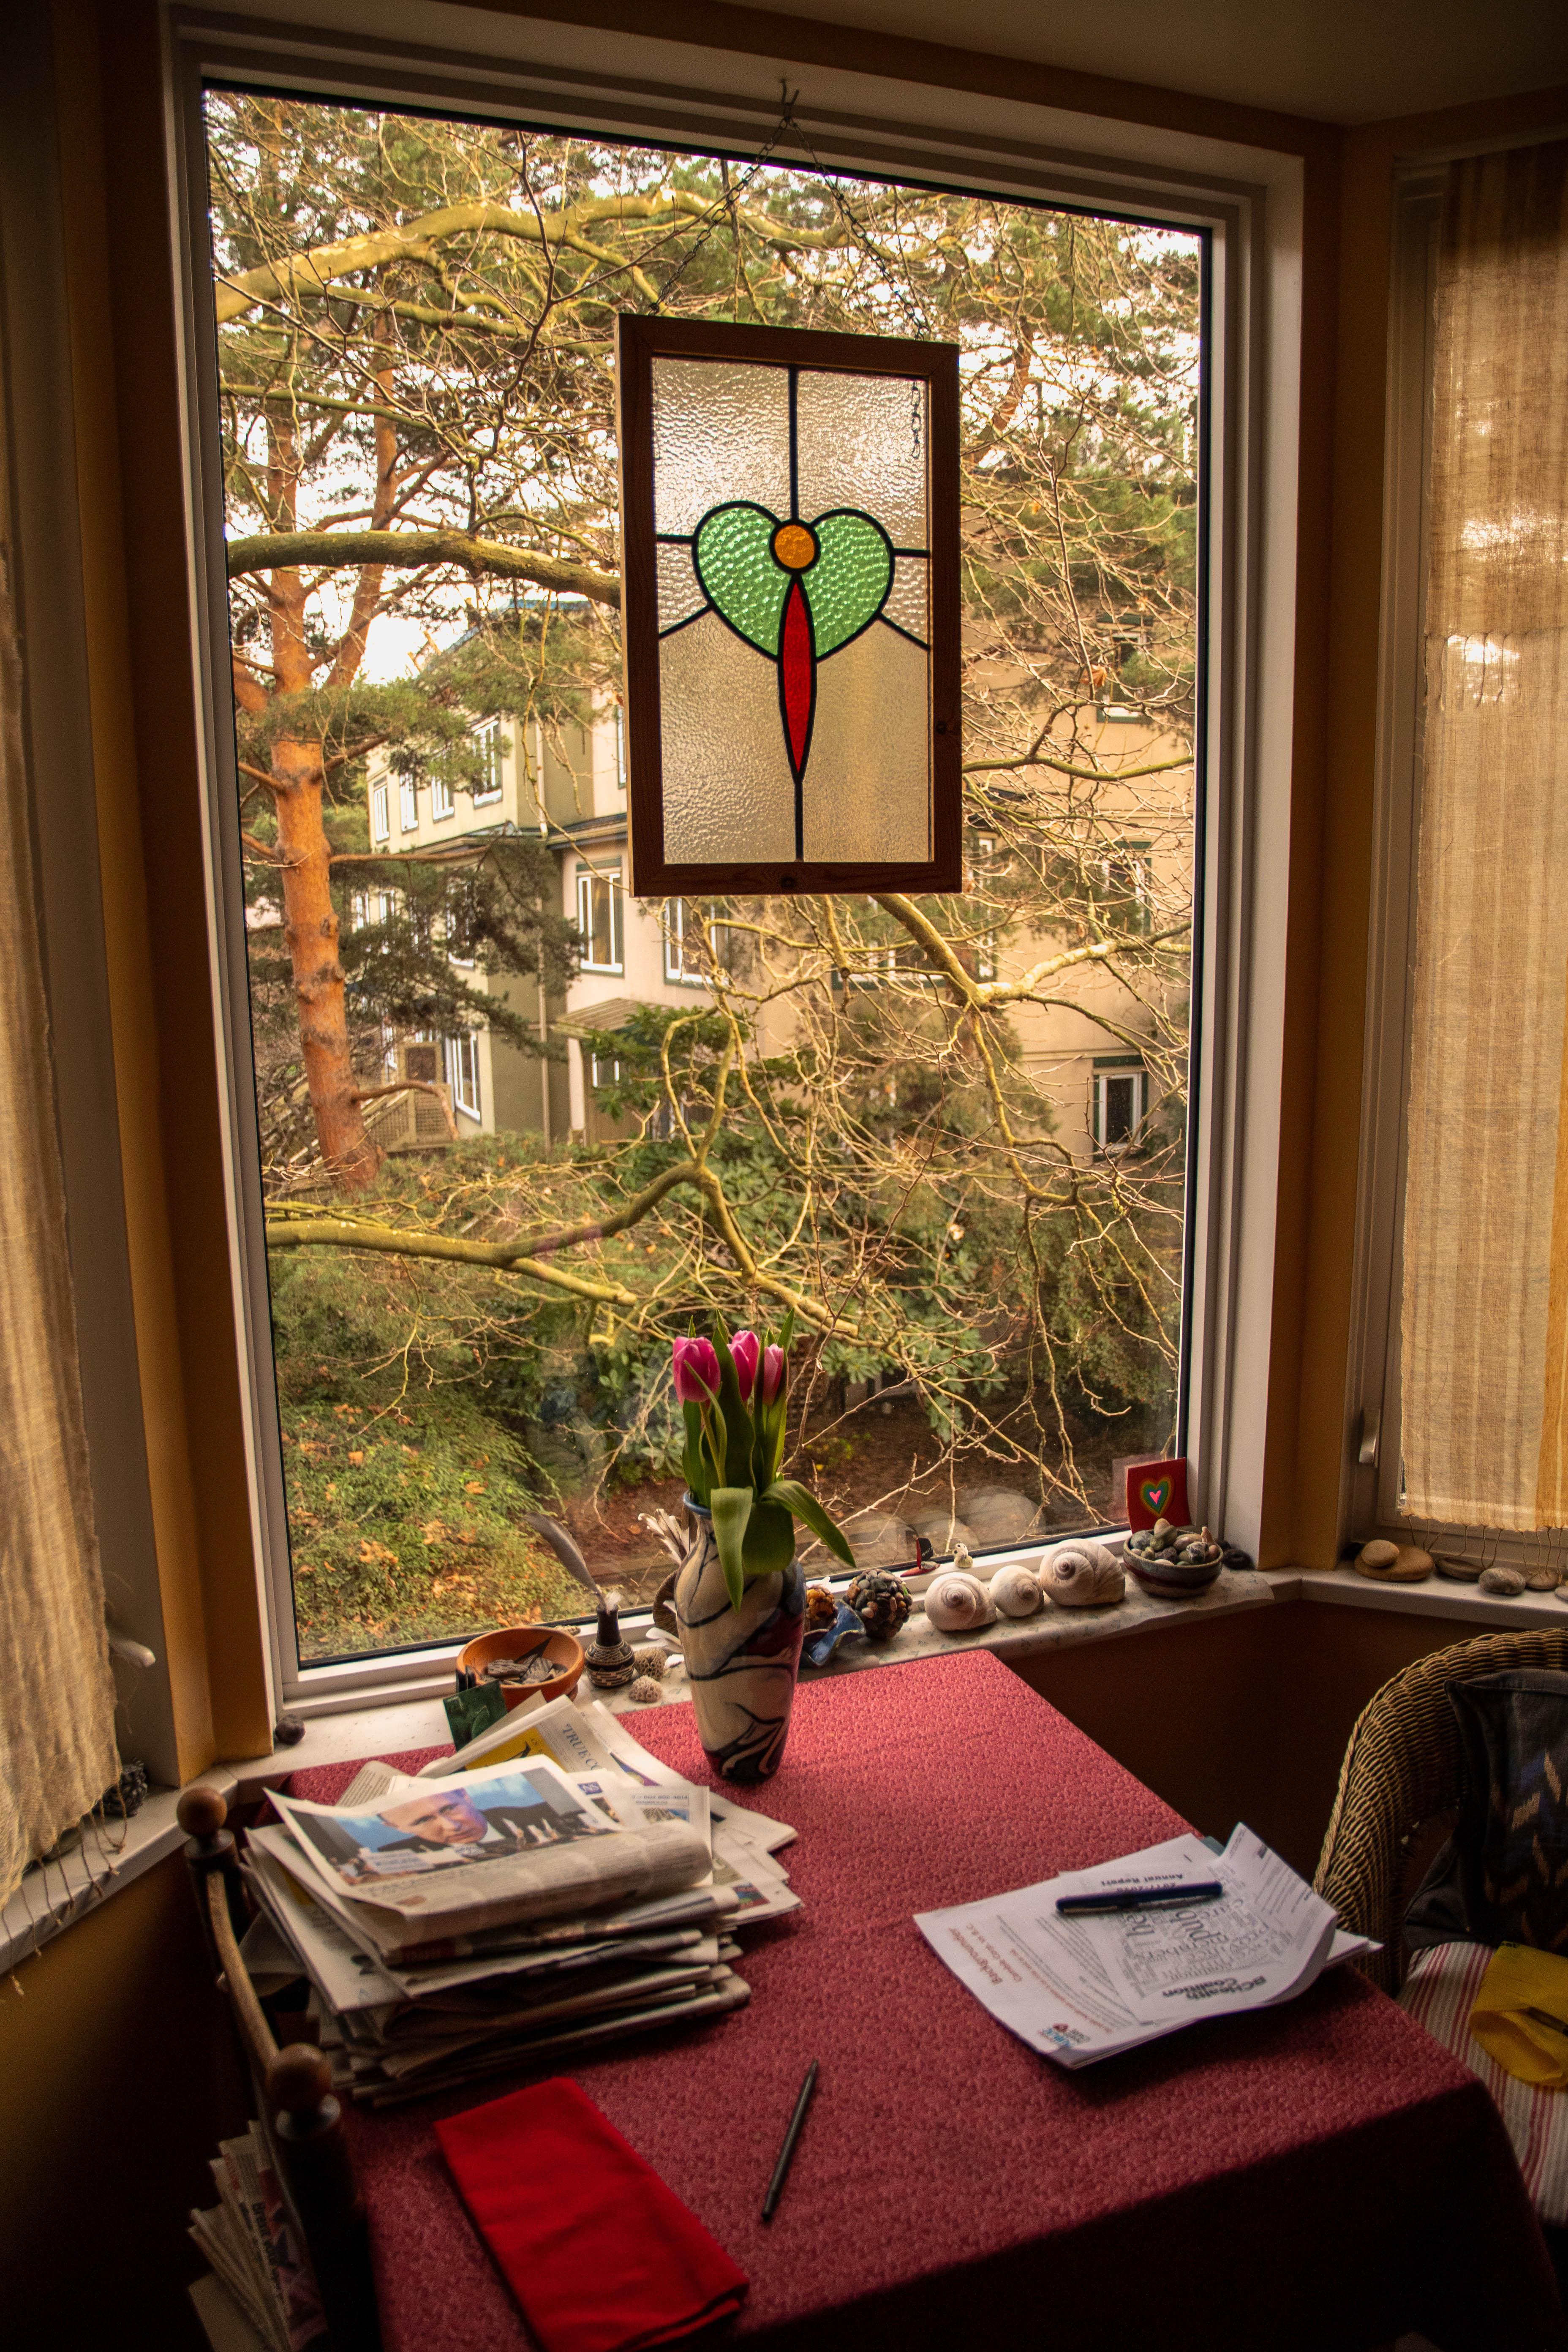 A kitchen window in the co-op